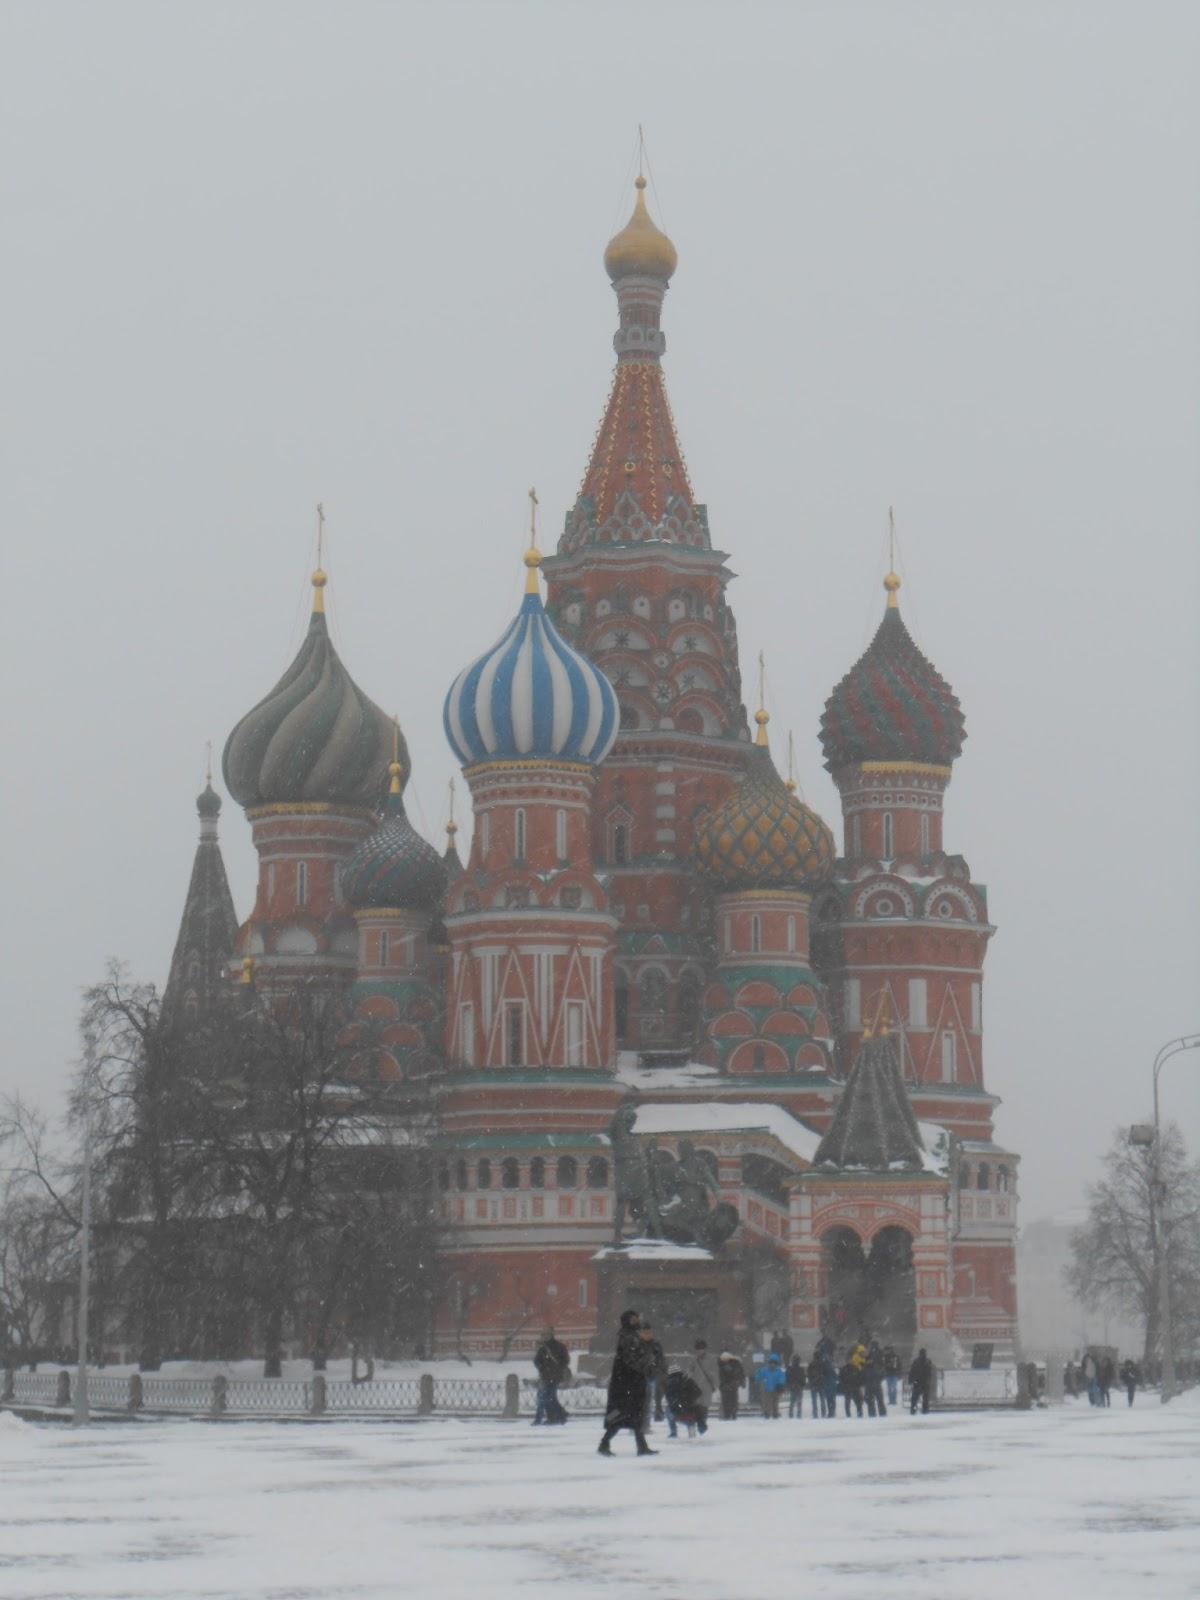 Snowy St Basil's MOscow